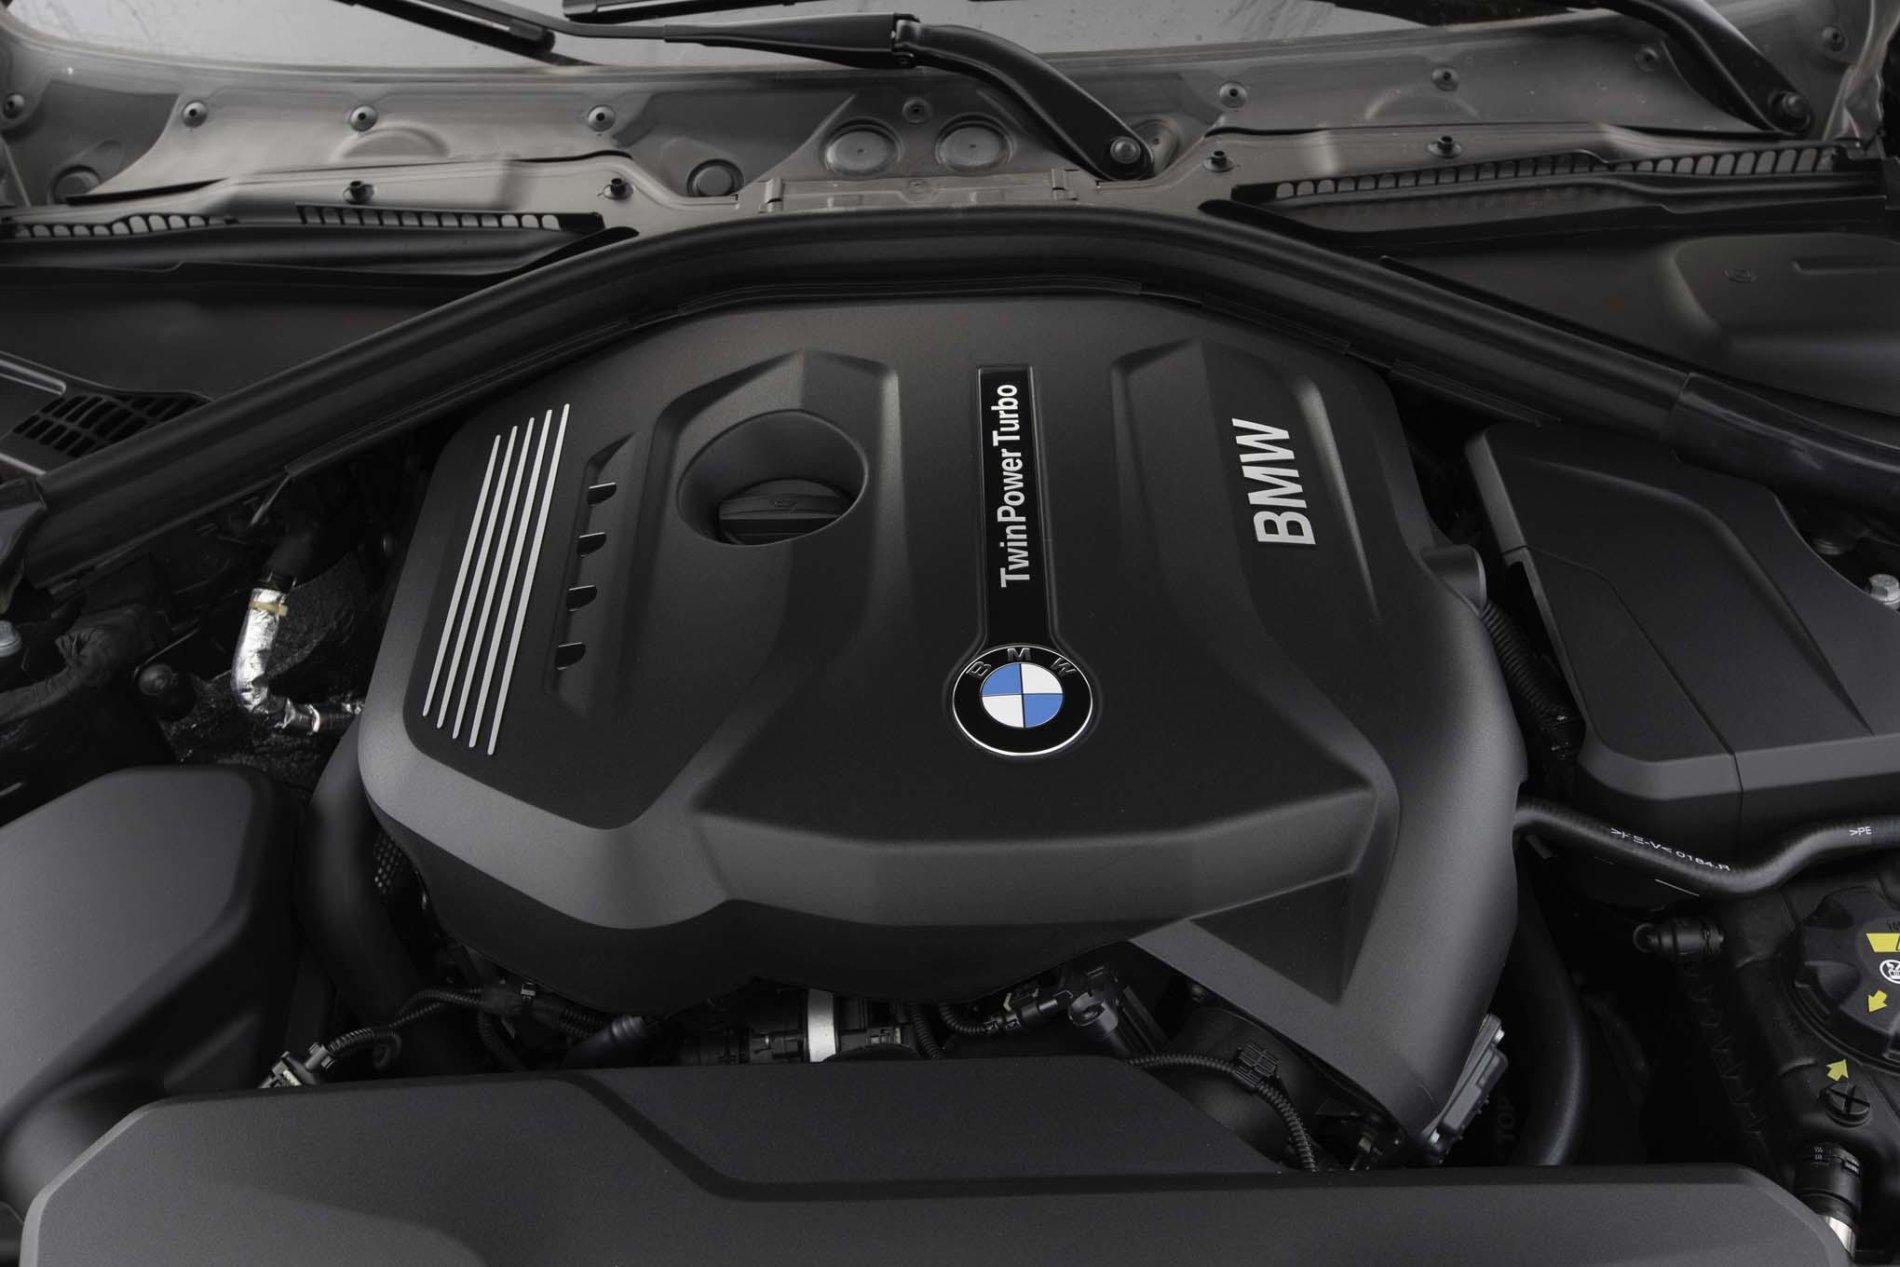 10 motoare pe benzina care merita sa echipeze viitoarea ta masina - 10 motoare pe benzina care merita sa echipeze viitoarea ta masina